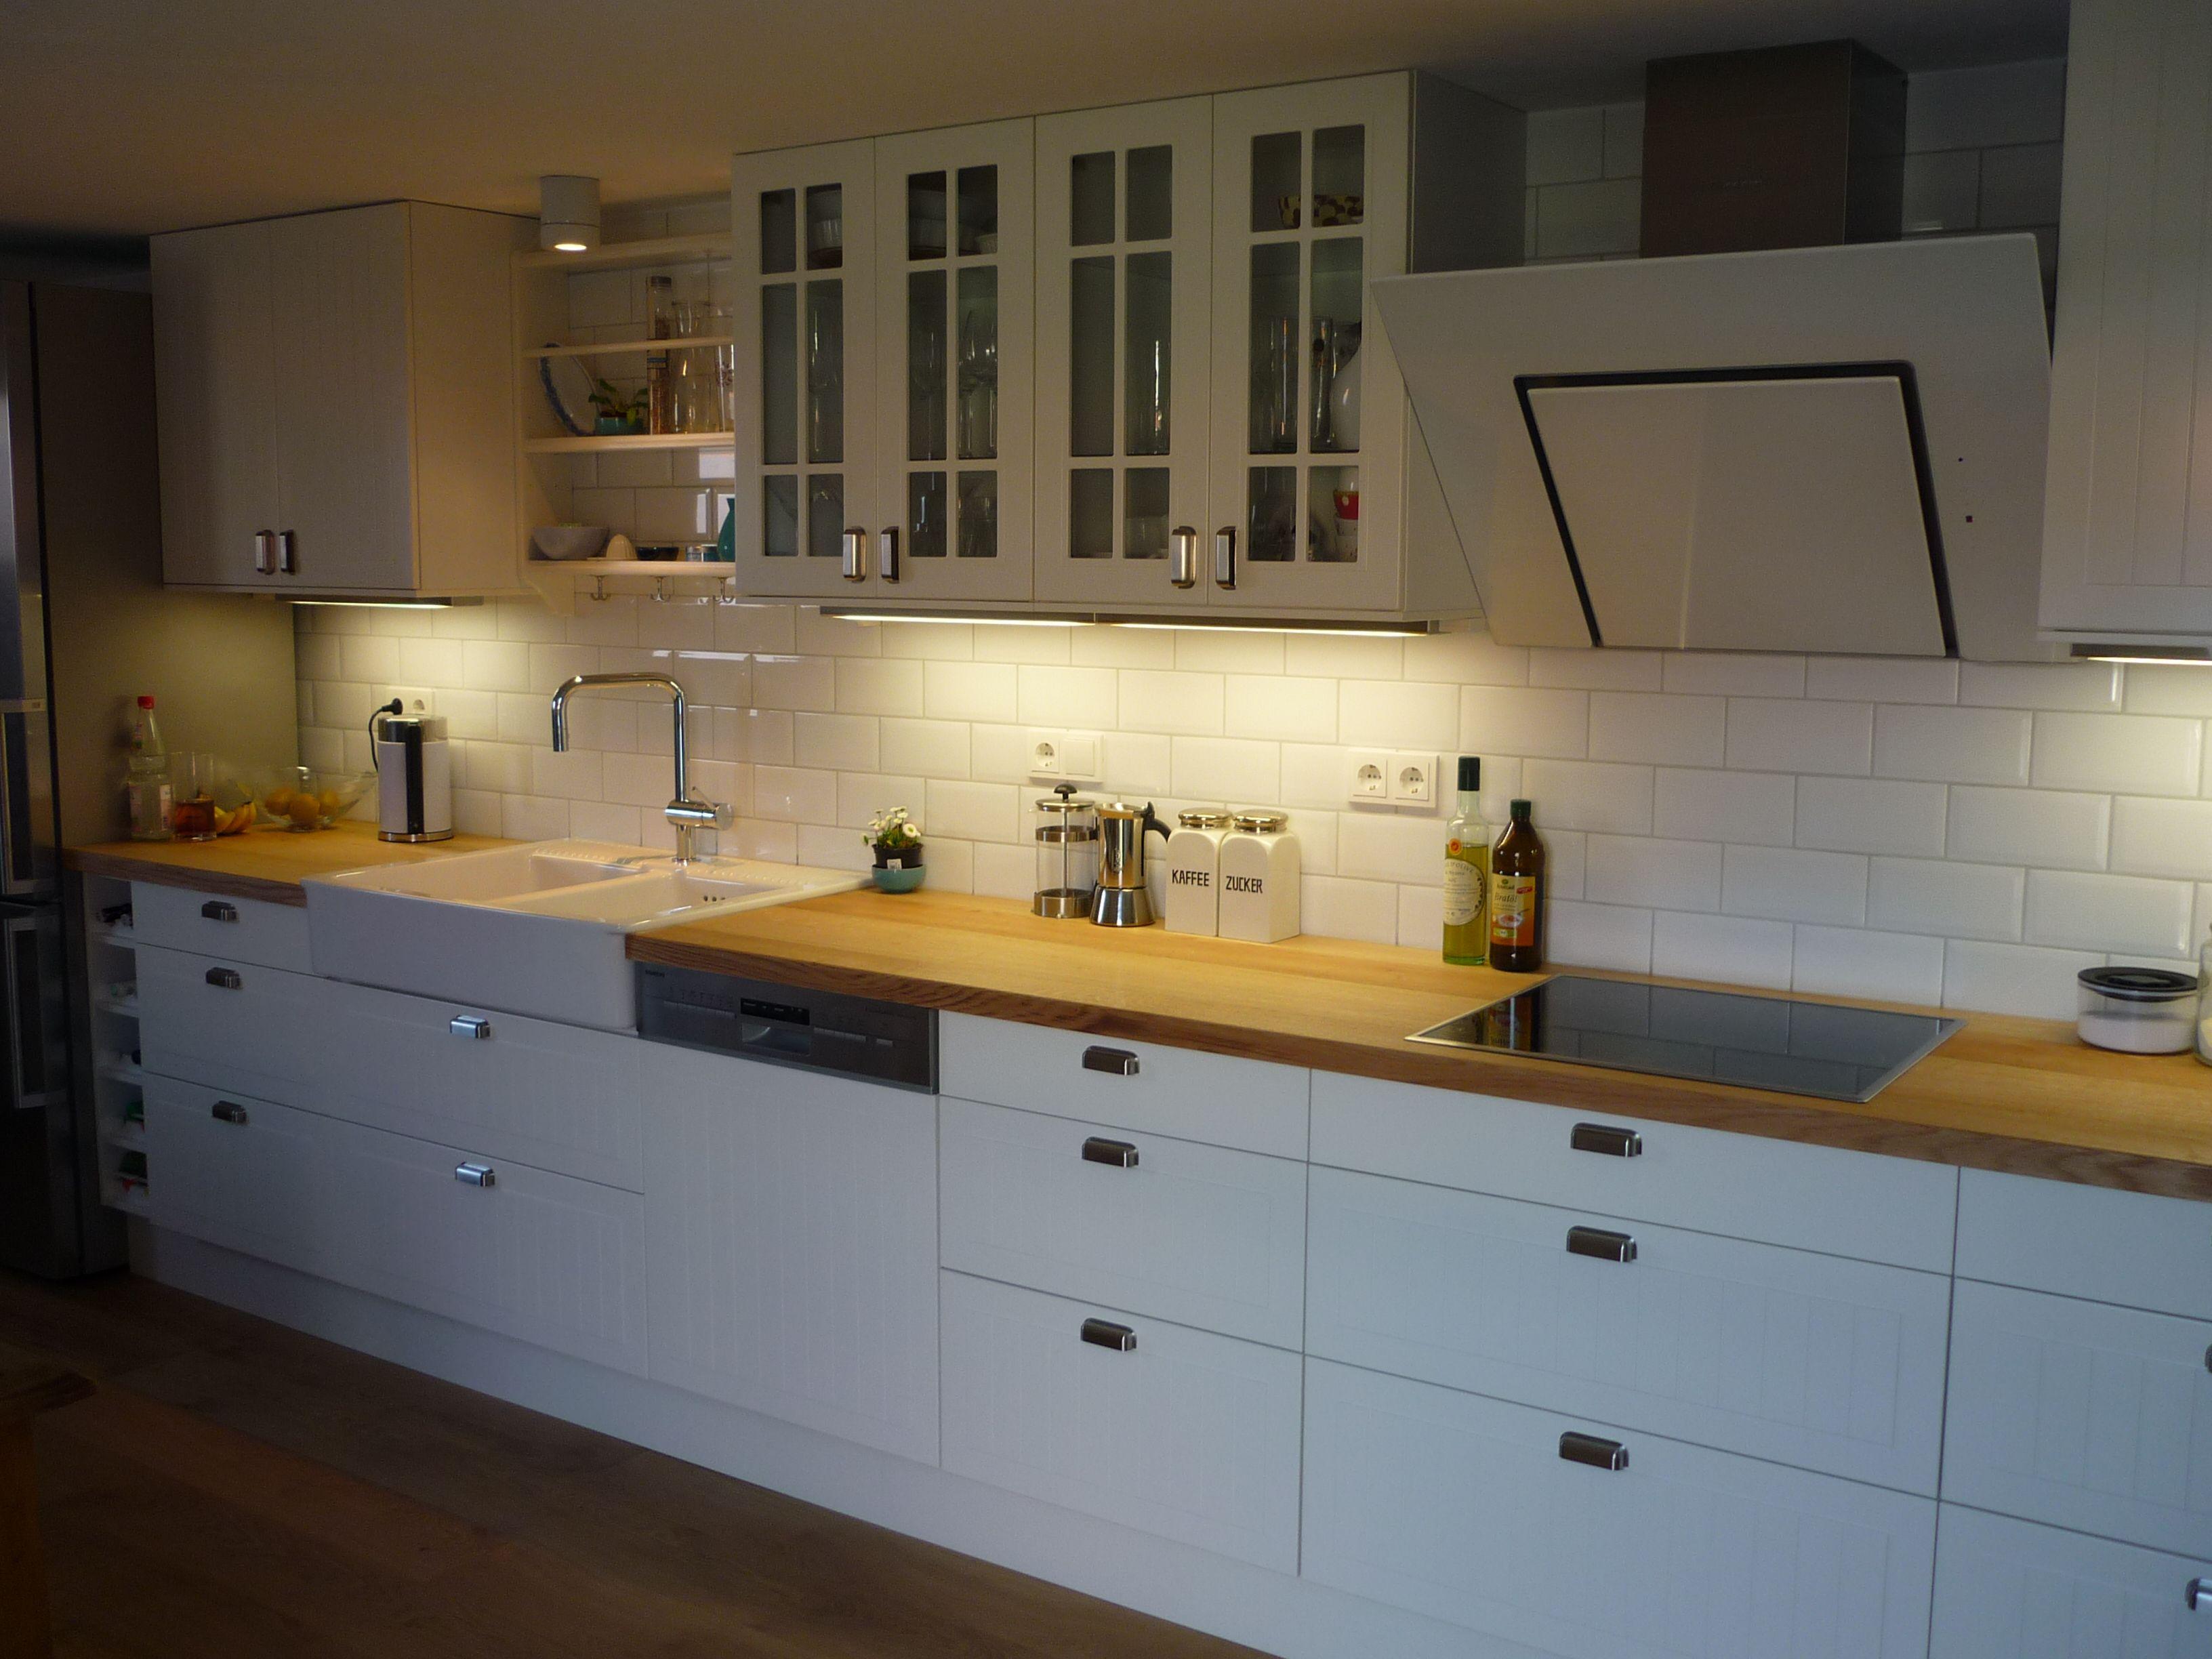 Ikea Küche mit Keramik waschbecken | Home | Pinterest | Keramik ...